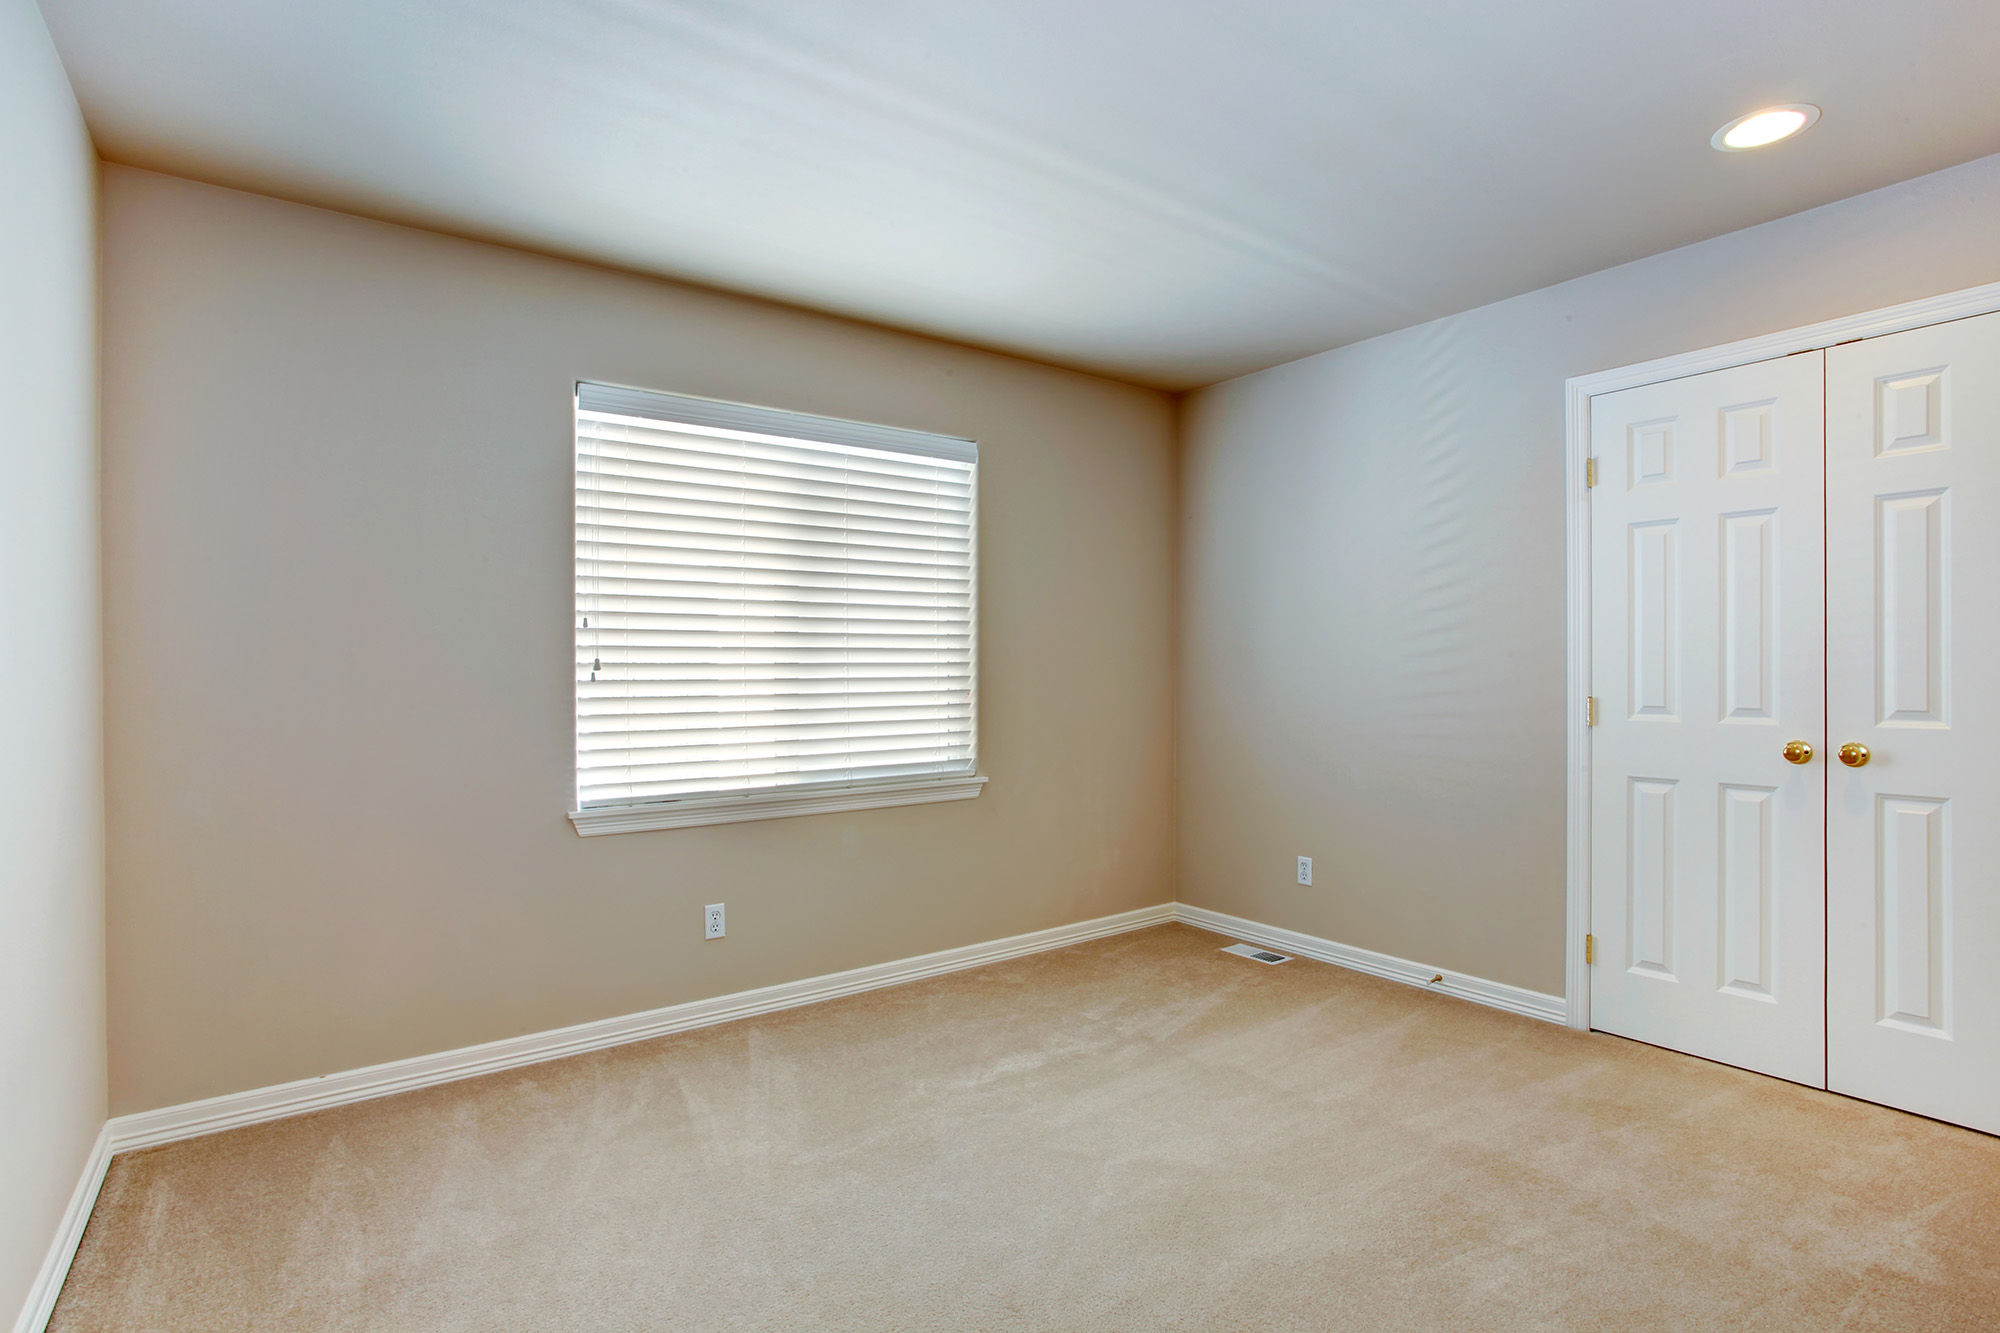 Simple empty room with light brown carpet floor